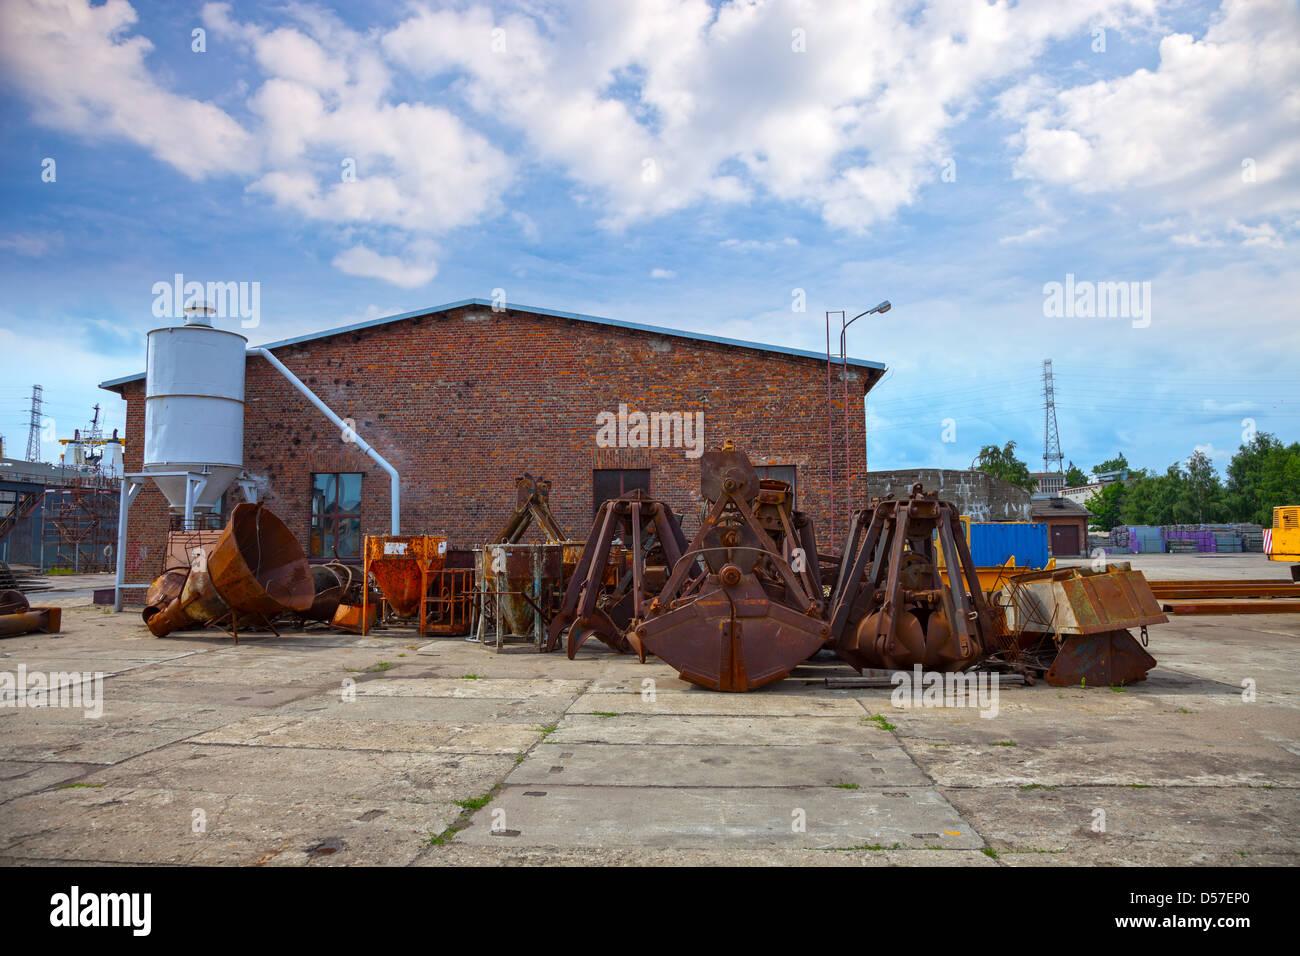 Many old rusty excavators bucket. - Stock Image